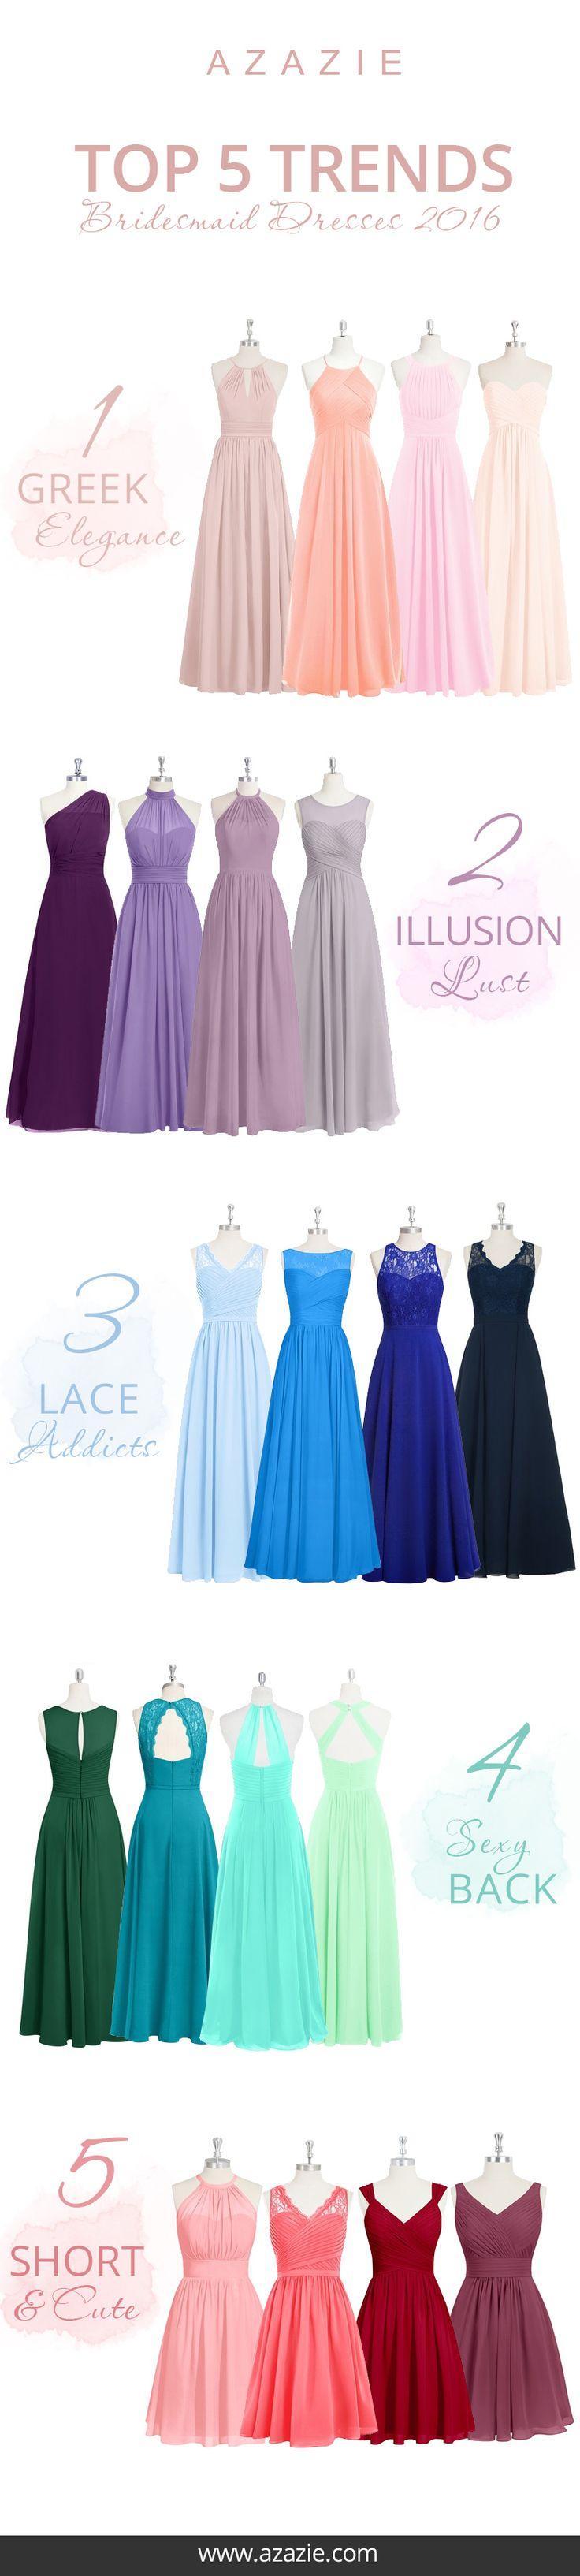 best vestidos de dama de honorv images on pinterest